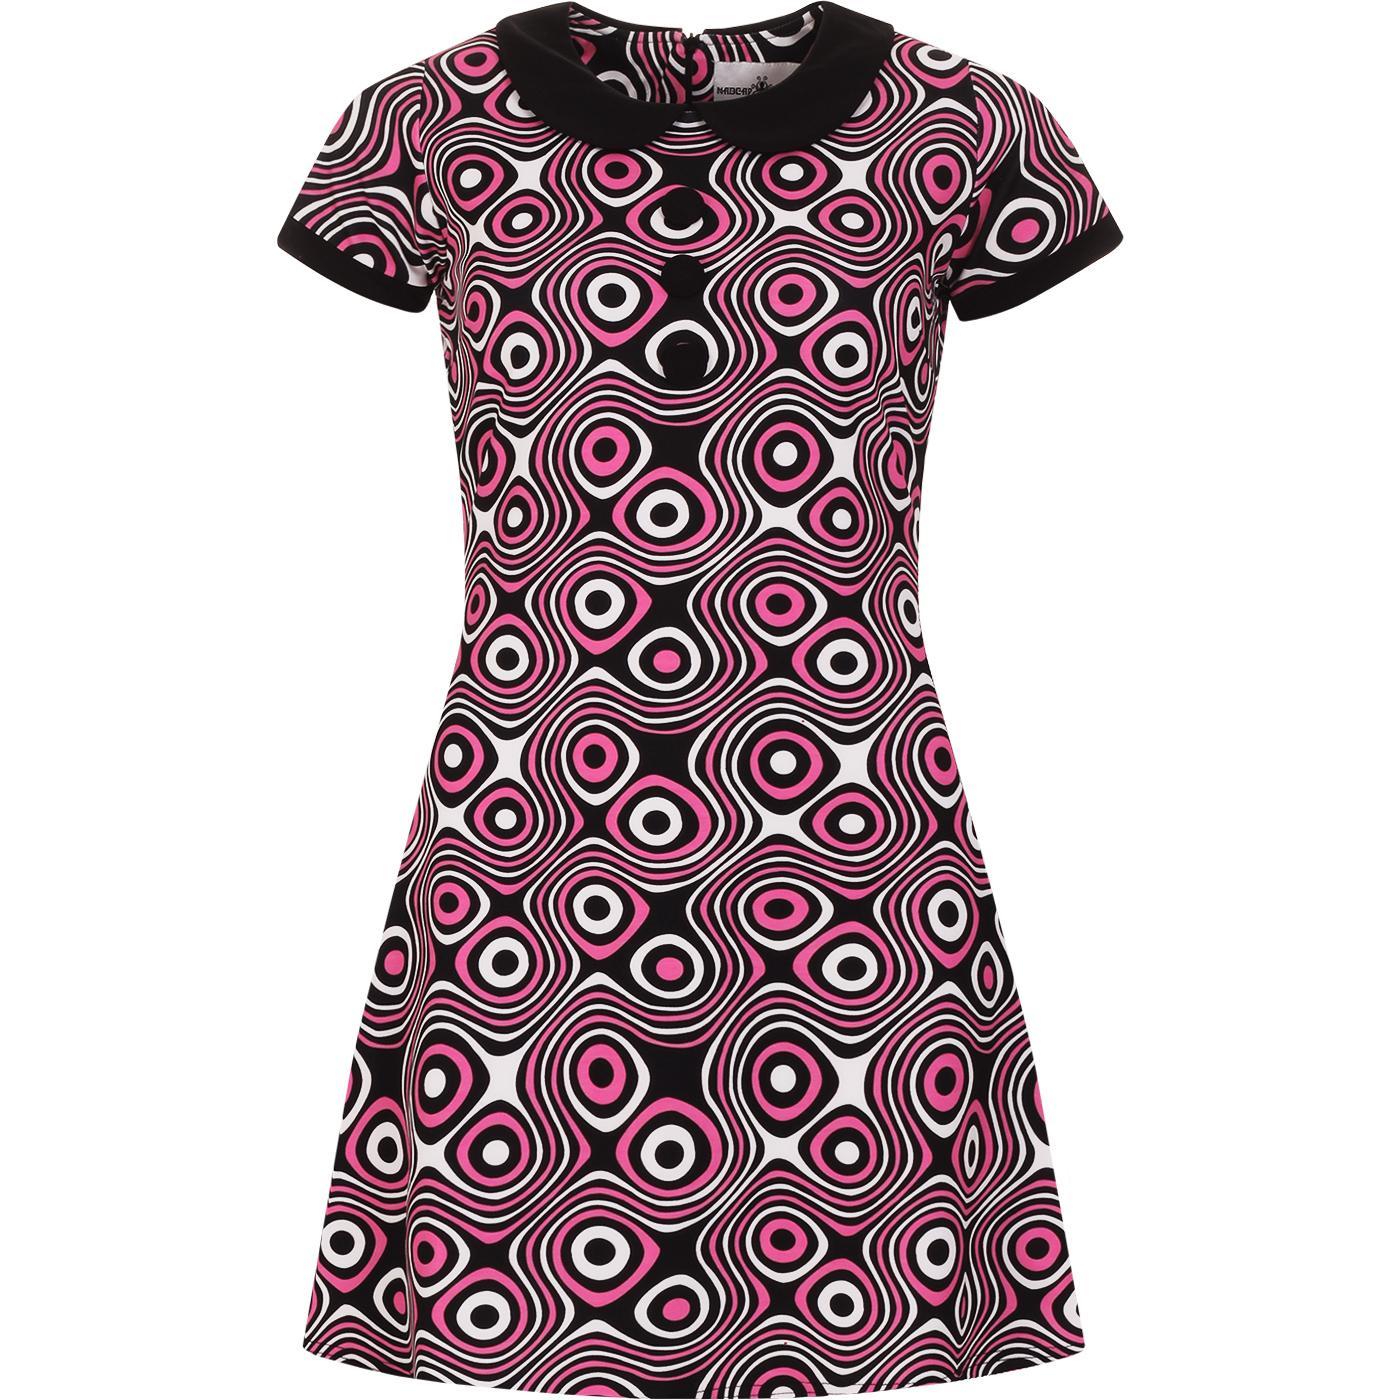 madcap england womens dollierocker op art pattern 60s mod dress black white hot pink